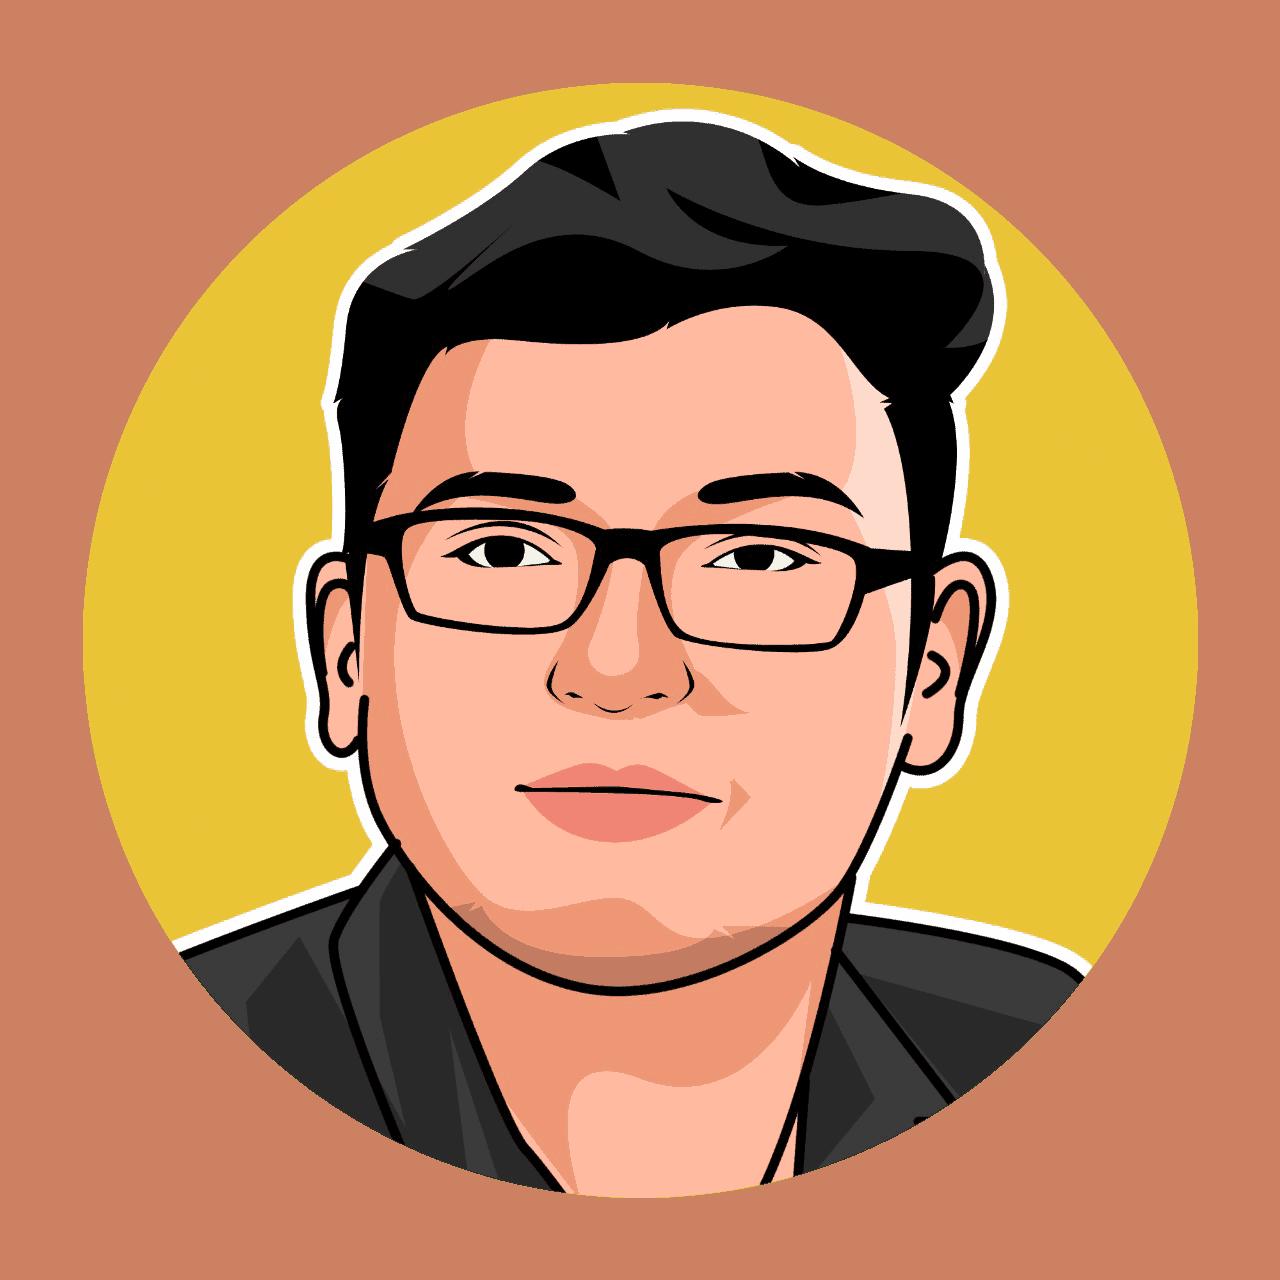 Kaushal - Head of Design